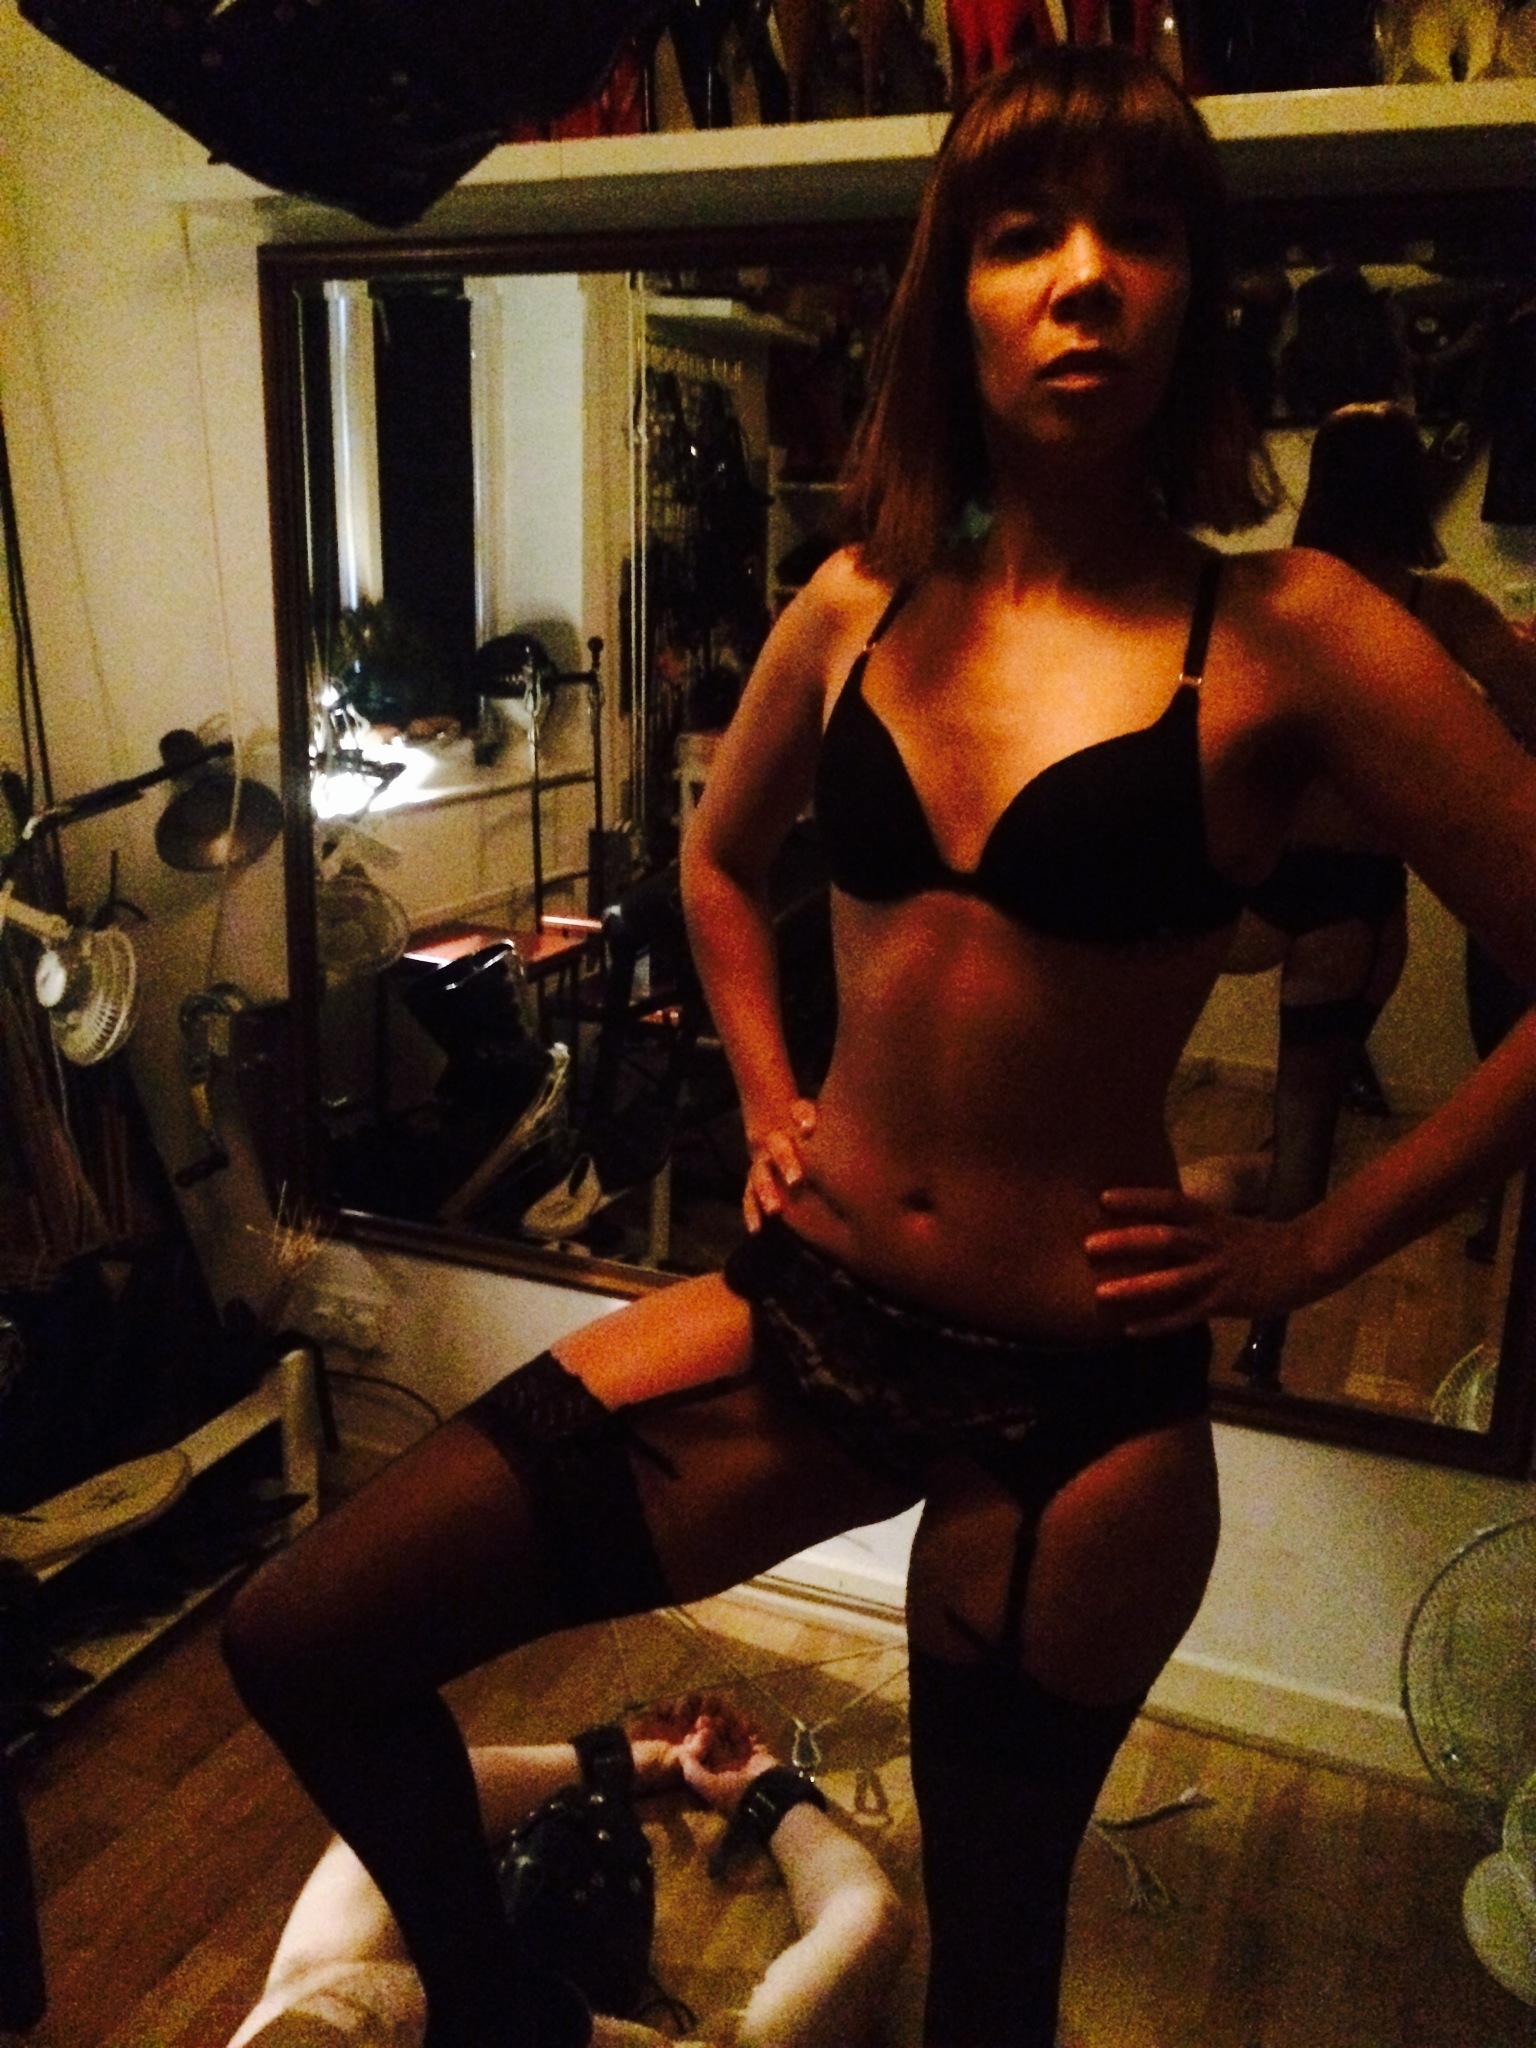 fetish-mistress-francesca-harding-london-bdsm-humiliation-punishment-mistress